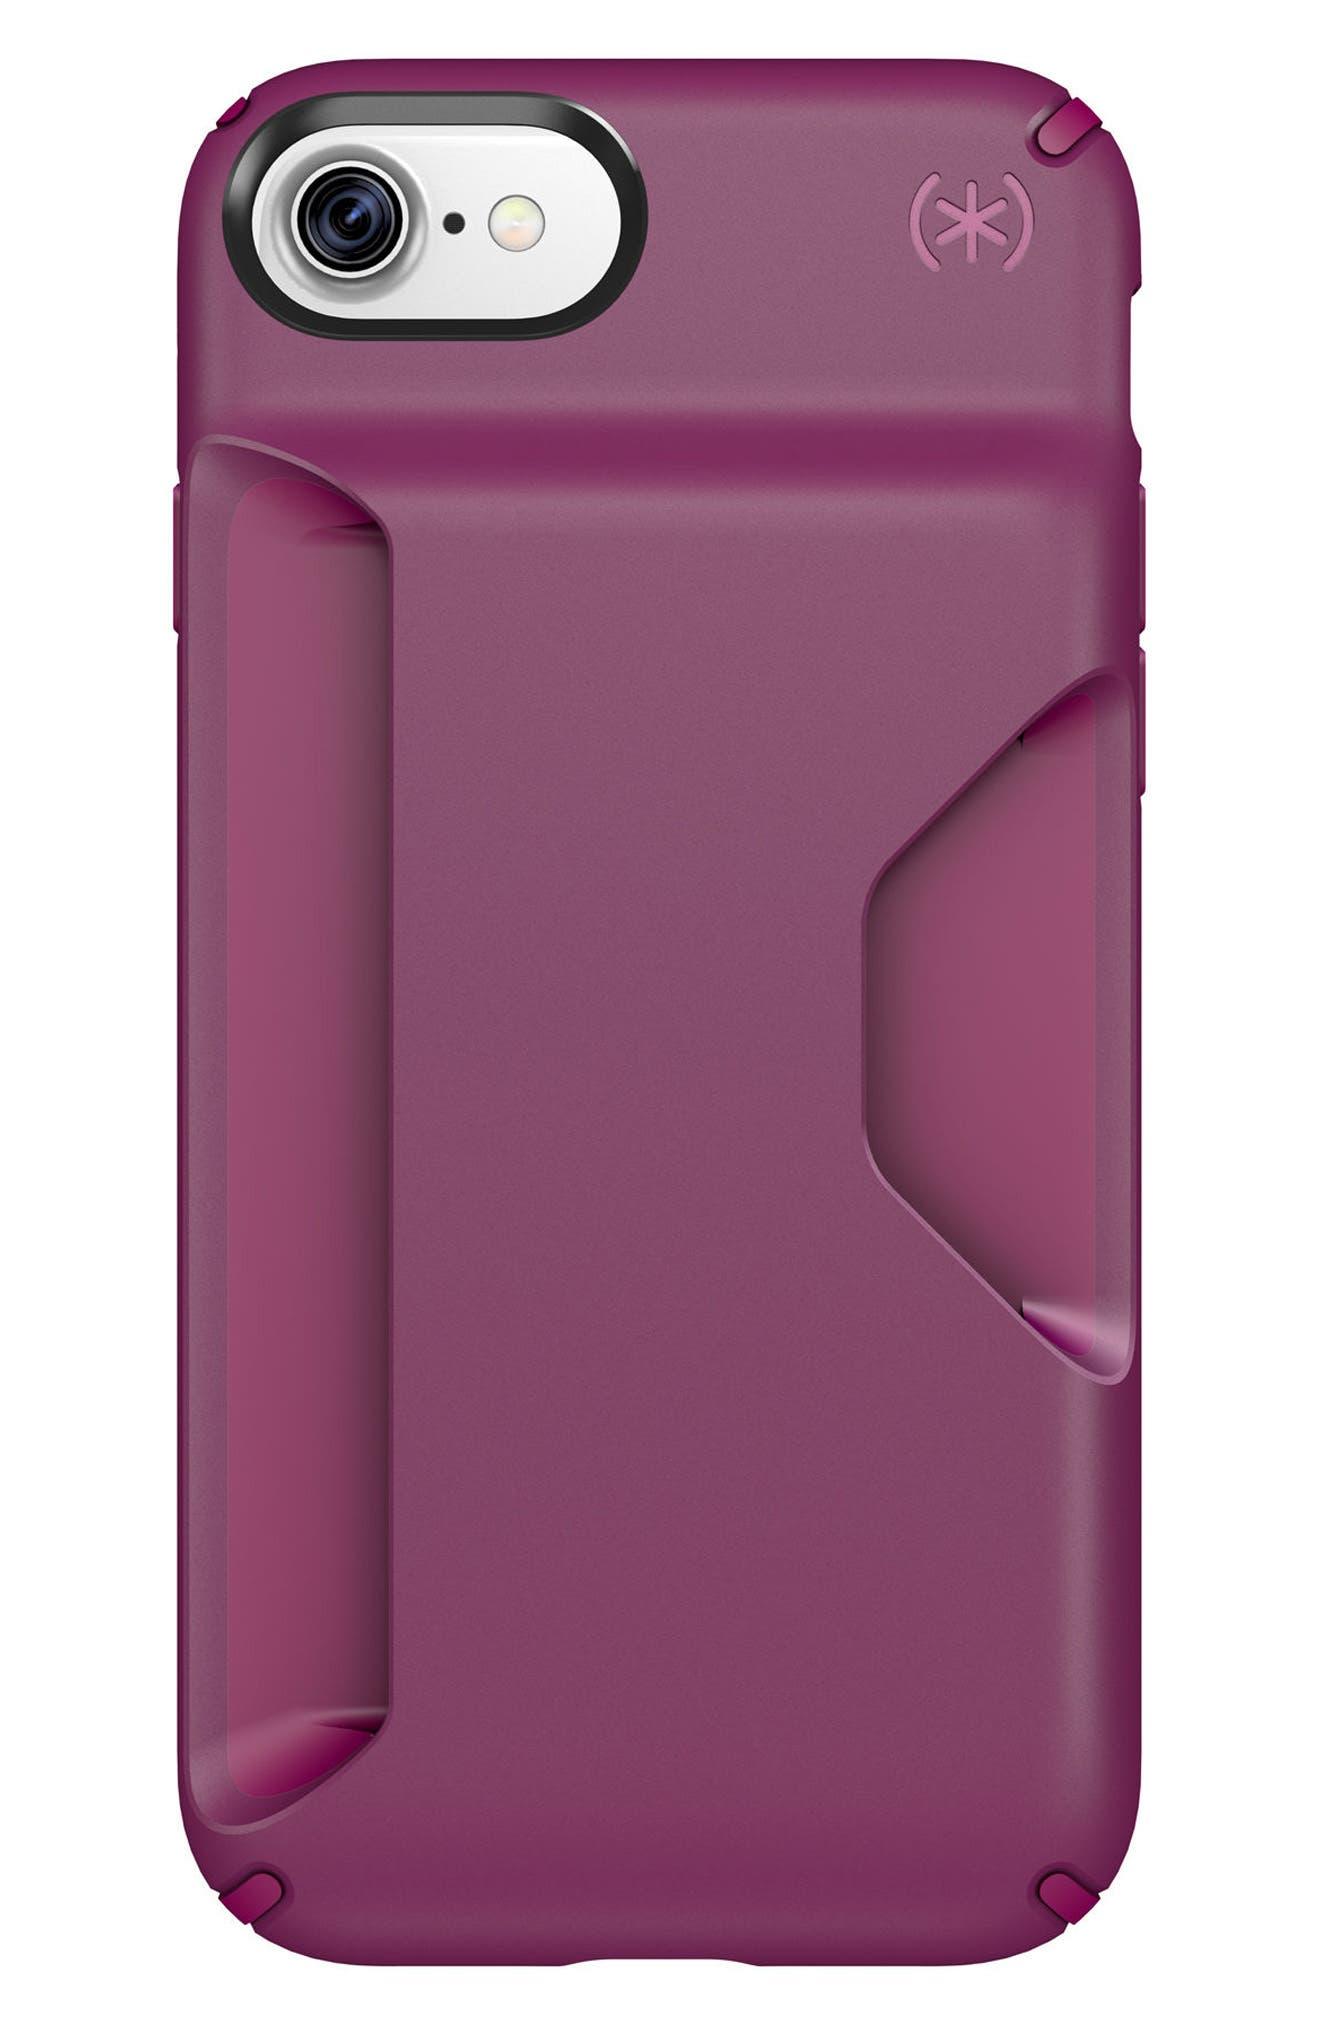 Main Image - Speck Presidio Wallet iPhone 6/6s/7/8 Plus Case